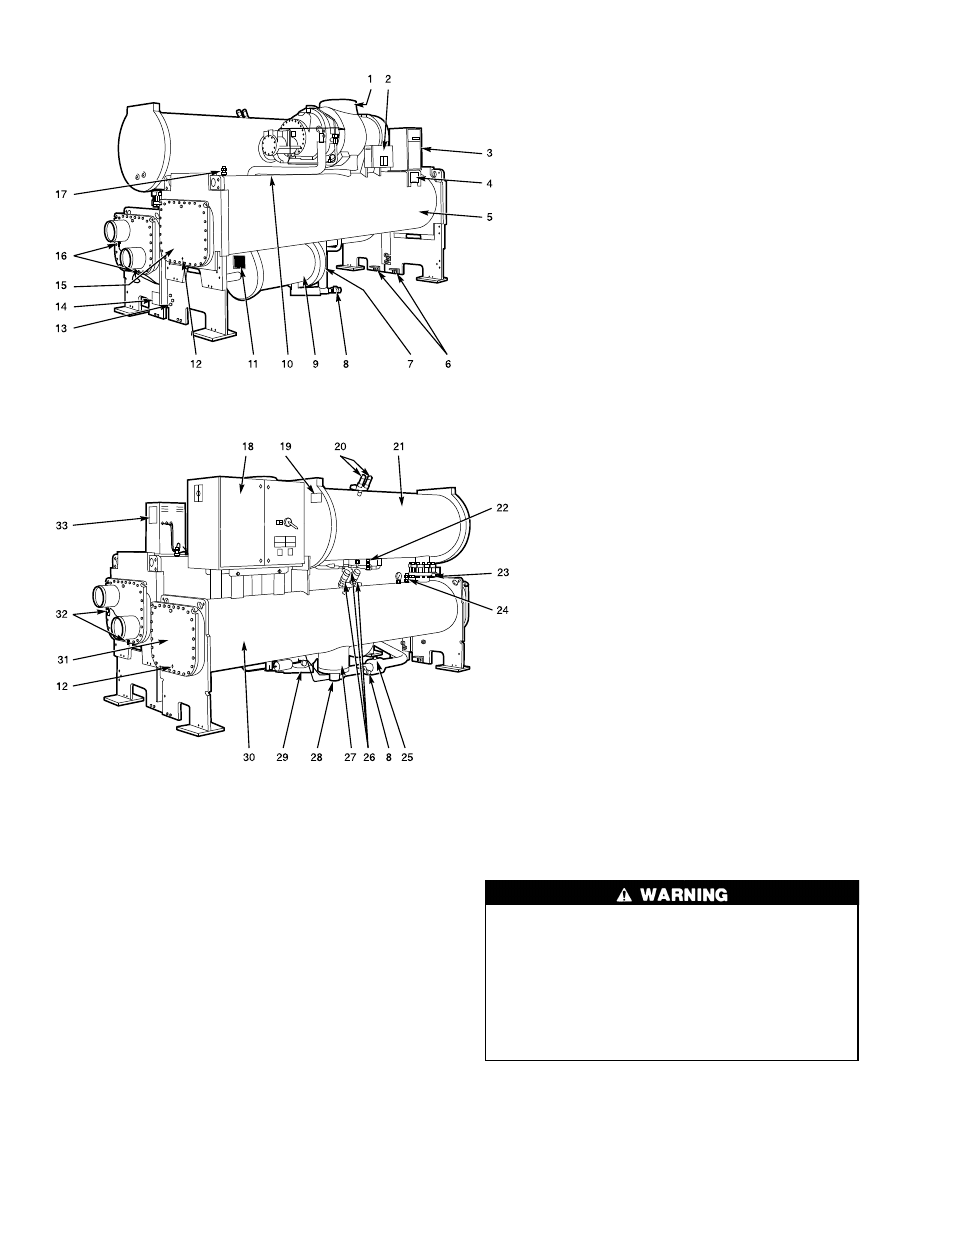 hyundai tucson 2017 wiring diagram